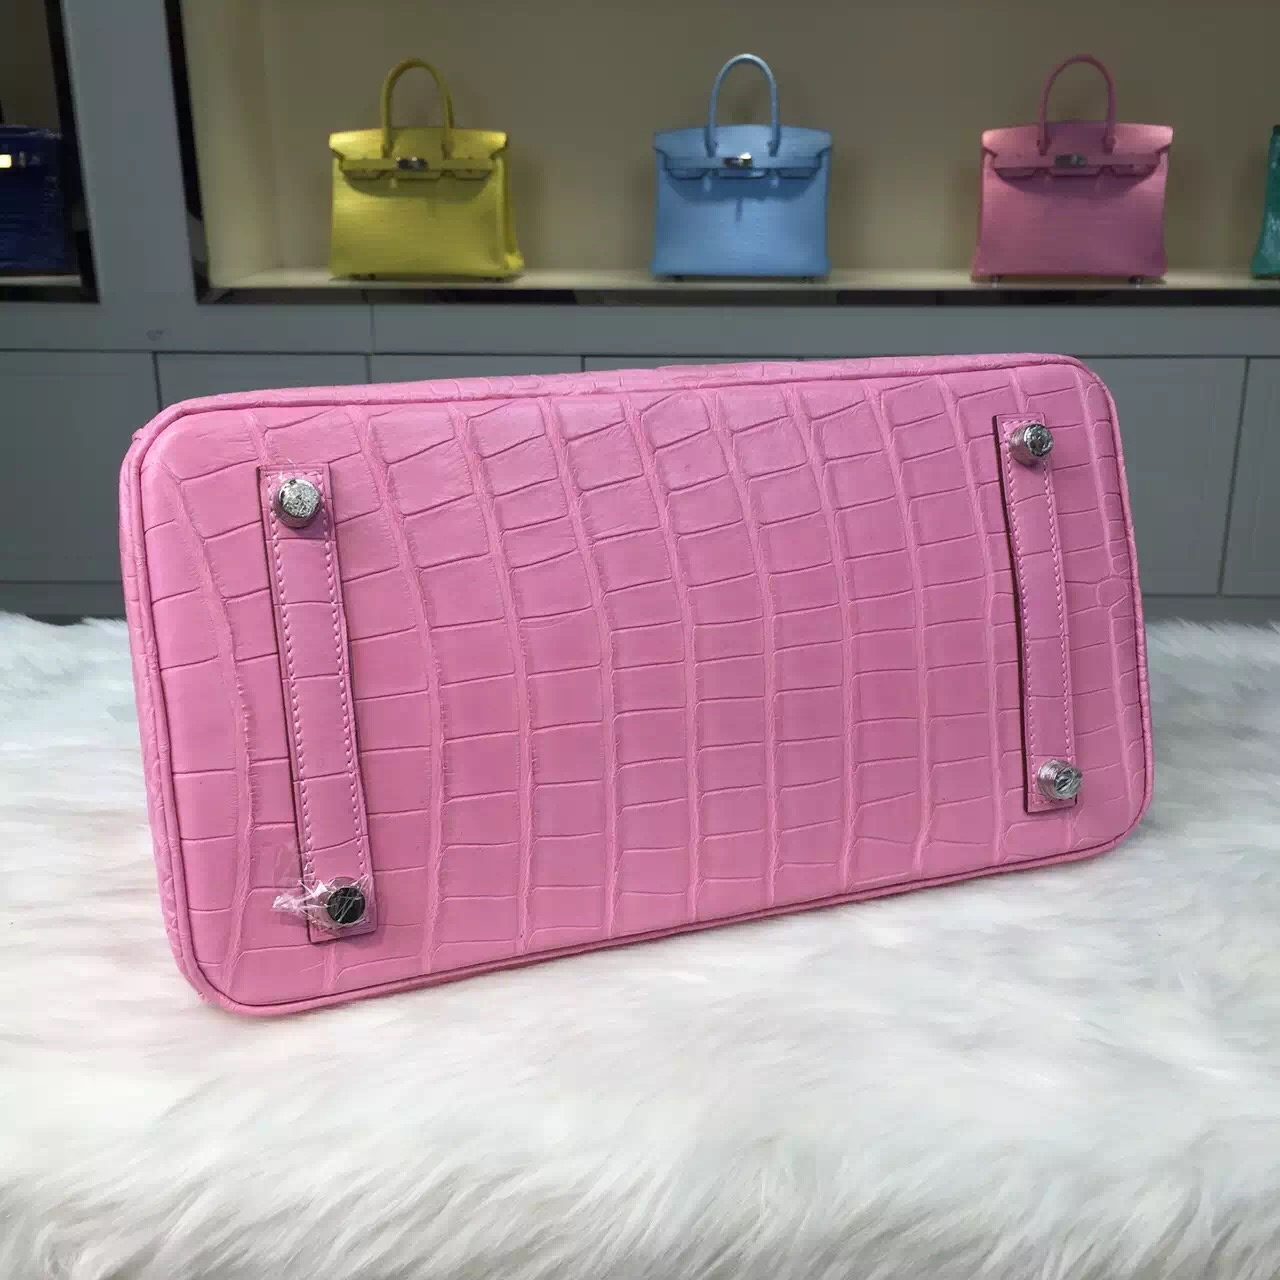 Hermes 5P Pink Original Crocodile Leather Birkin Bag 30CM Gold/Silver Hardware